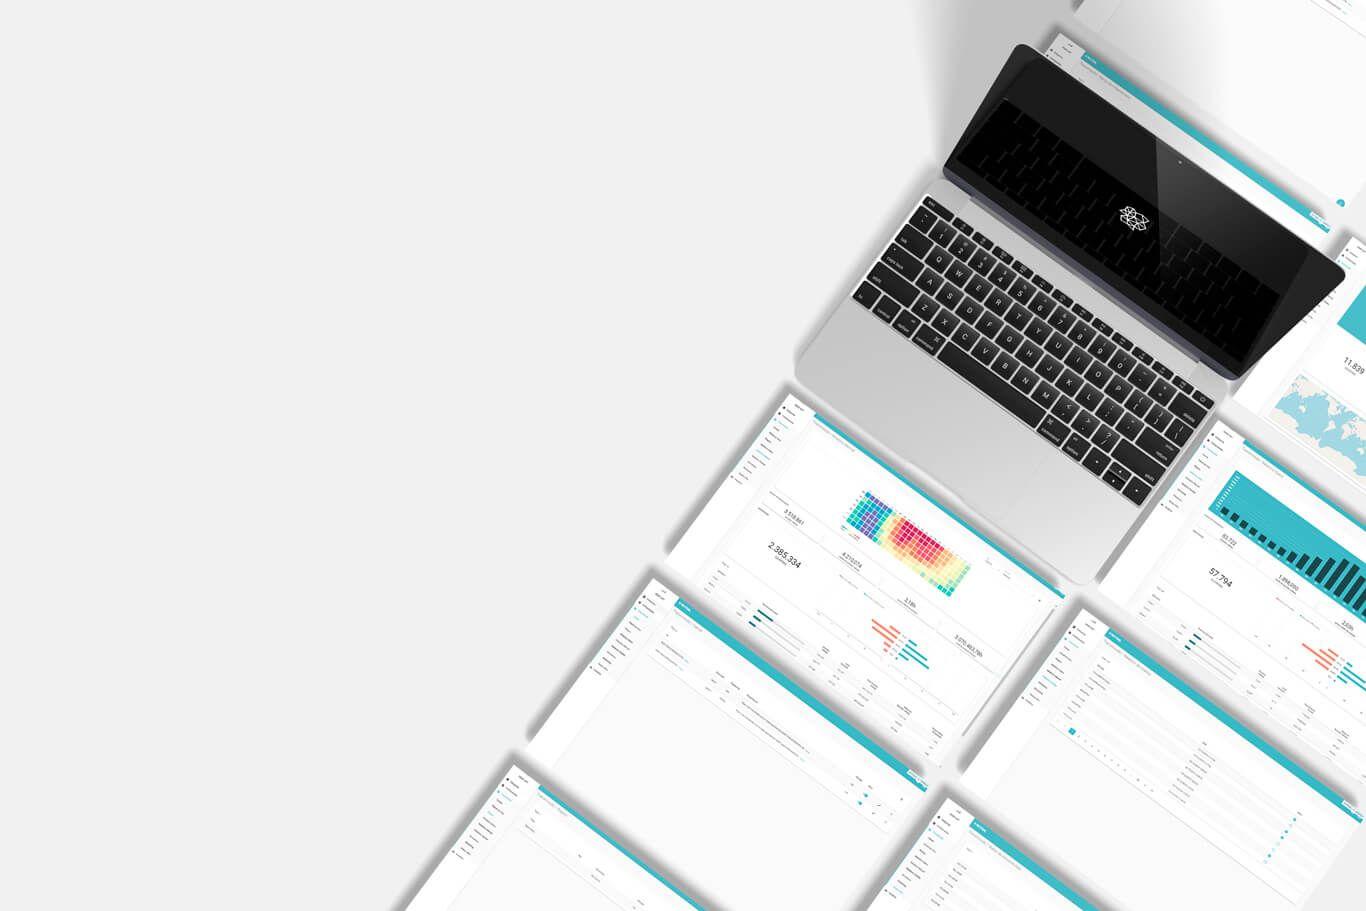 Nextdial Intelligence permite medir o número de ouvintes na Internet